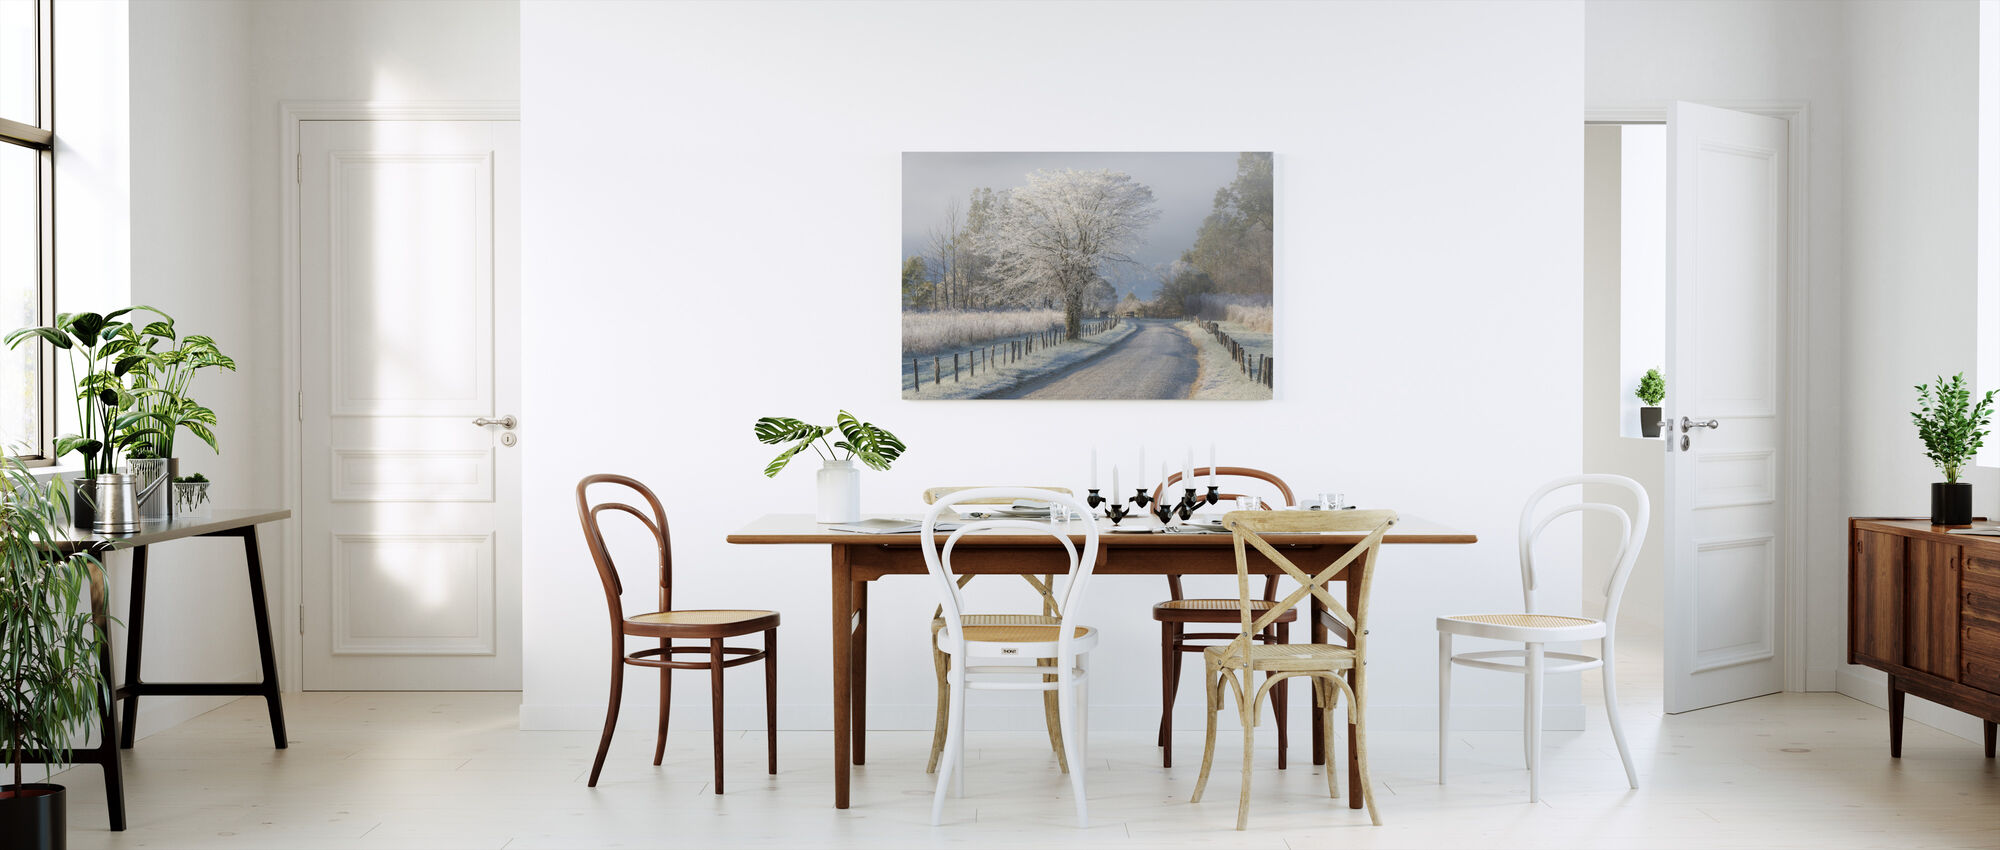 Frosty Morning - Canvas print - Kitchen